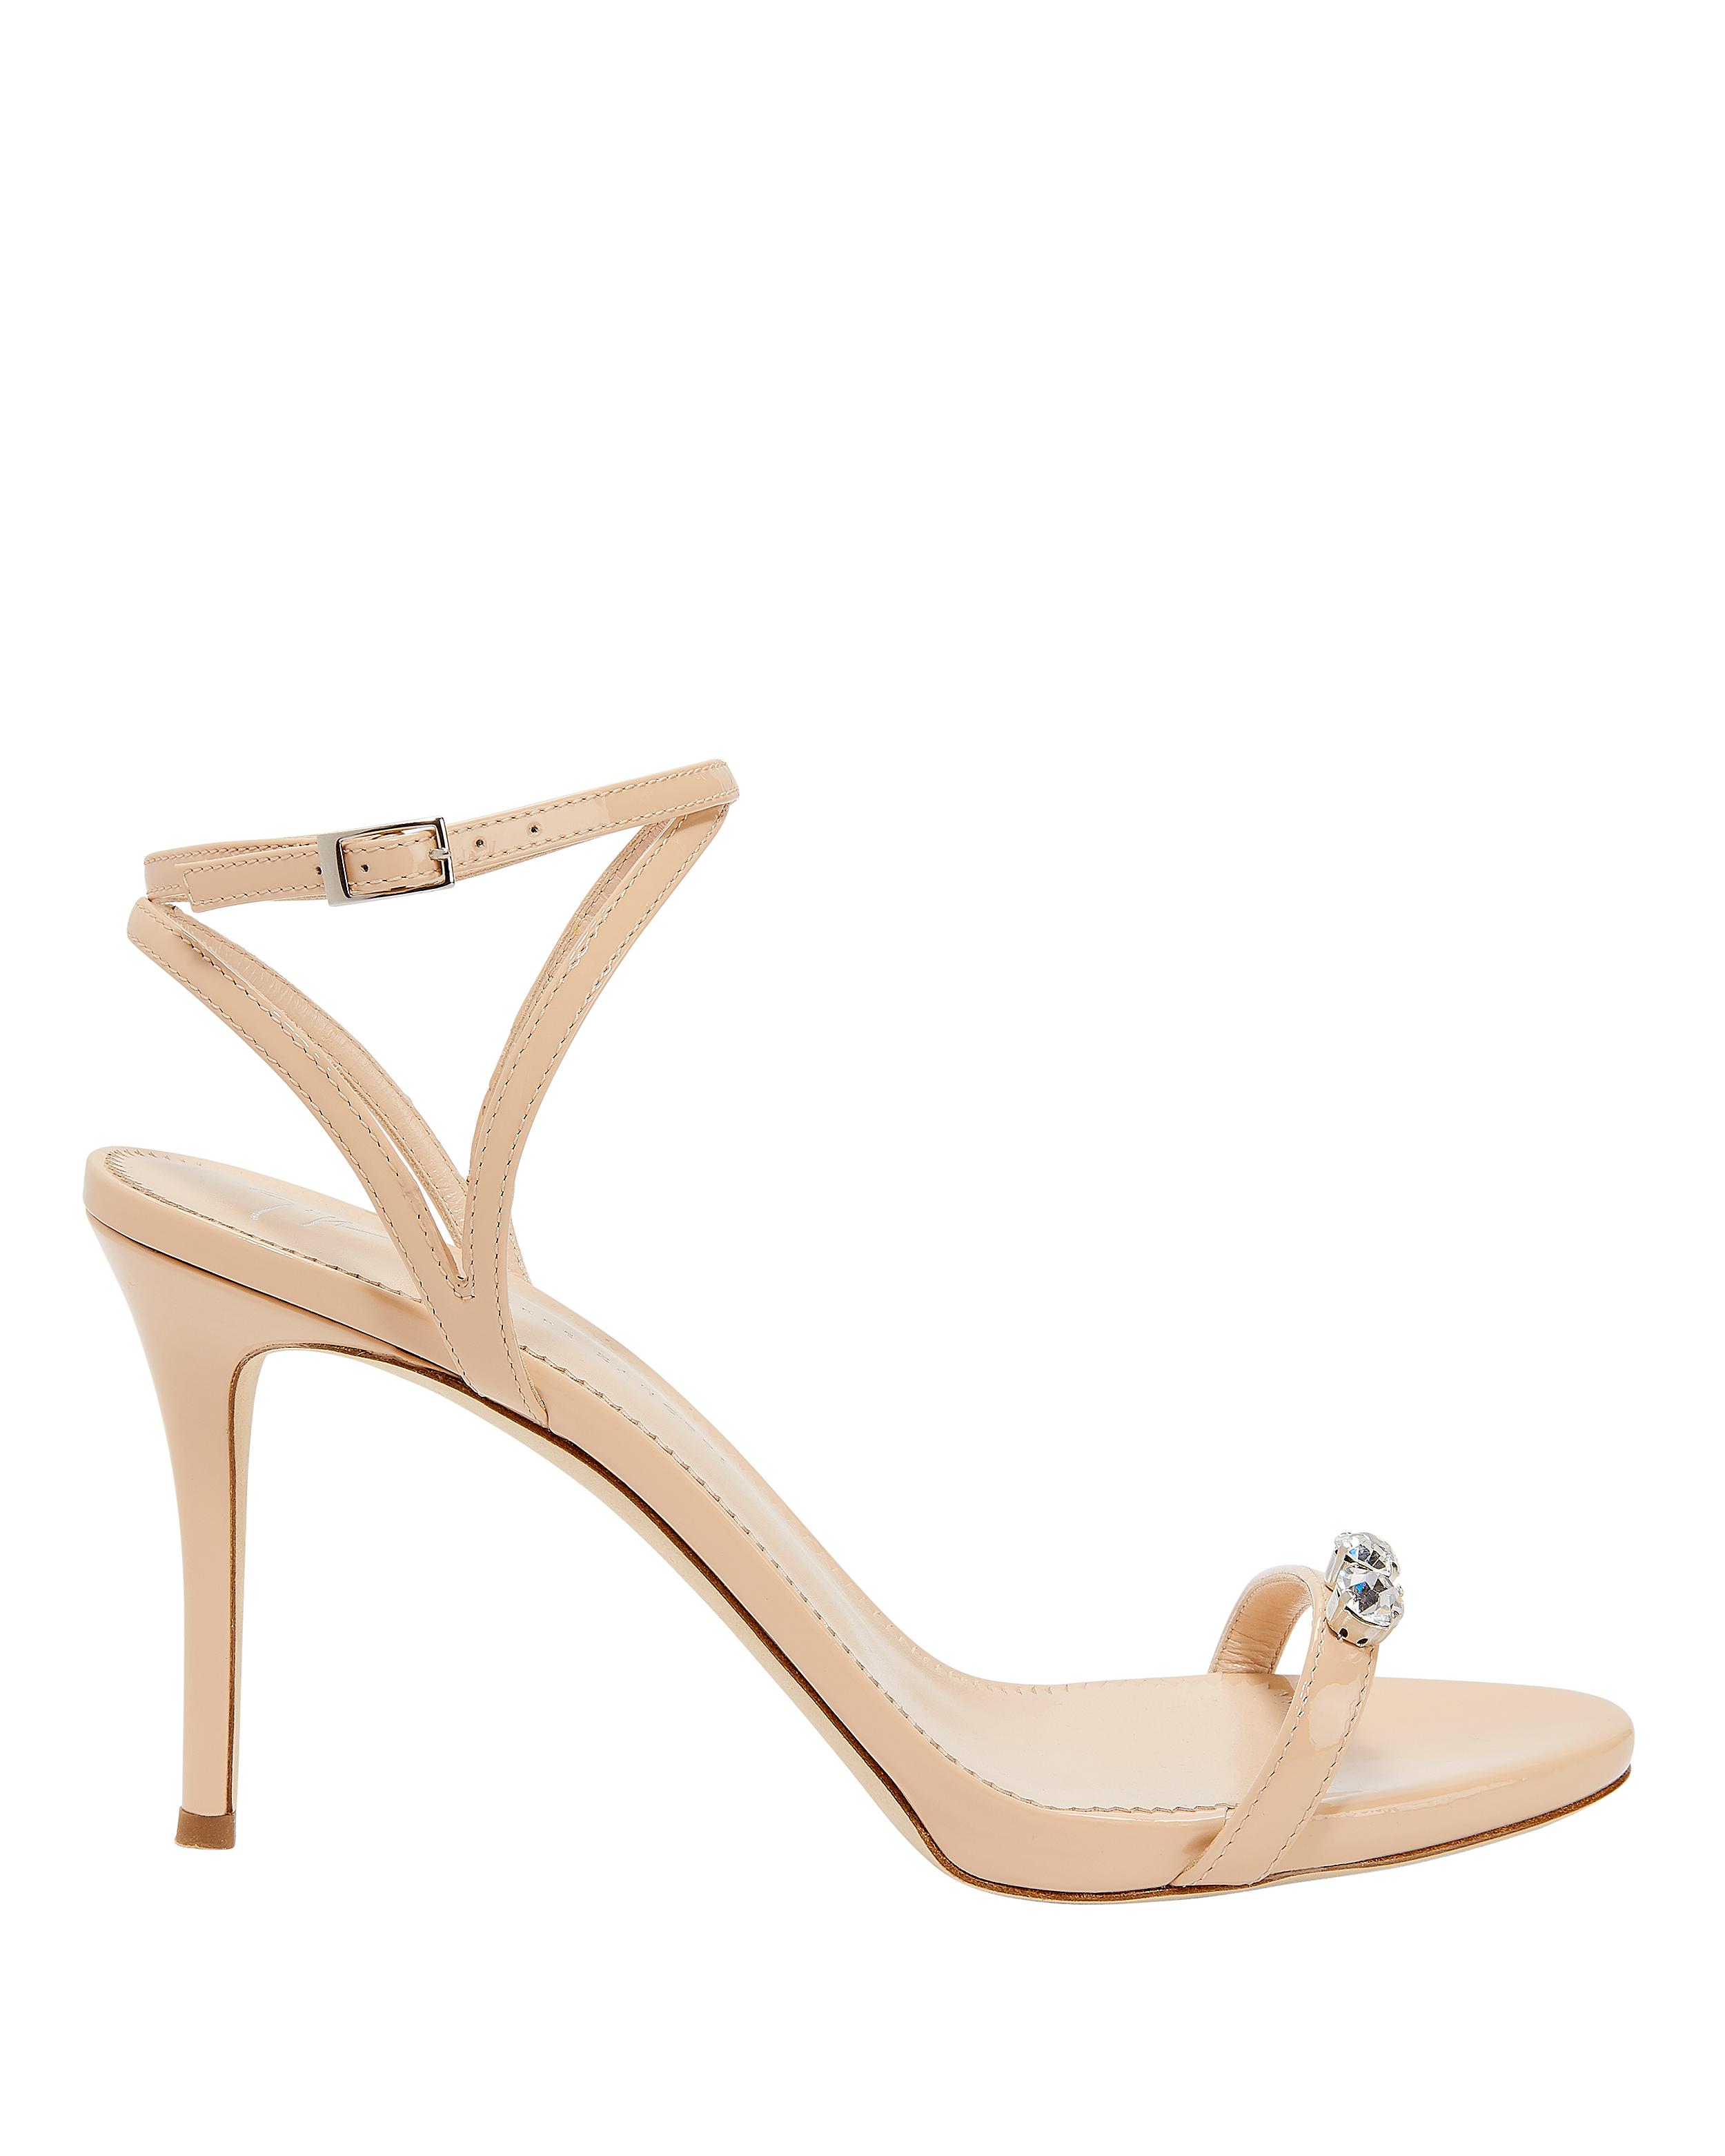 ddcfabc9bd5548 Giuseppe Zanotti Alien Embellished Patent Leather Sandals